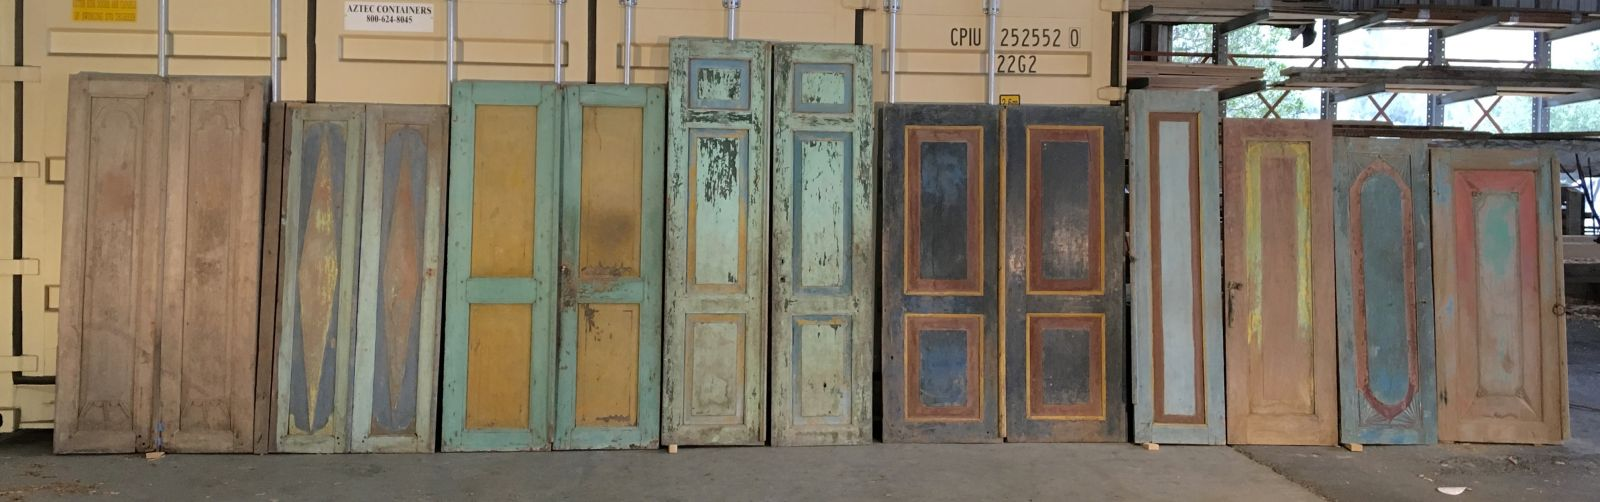 Reclaimed Indonesian Doors & Teak Architectural Salvage - Vintage Timberworks